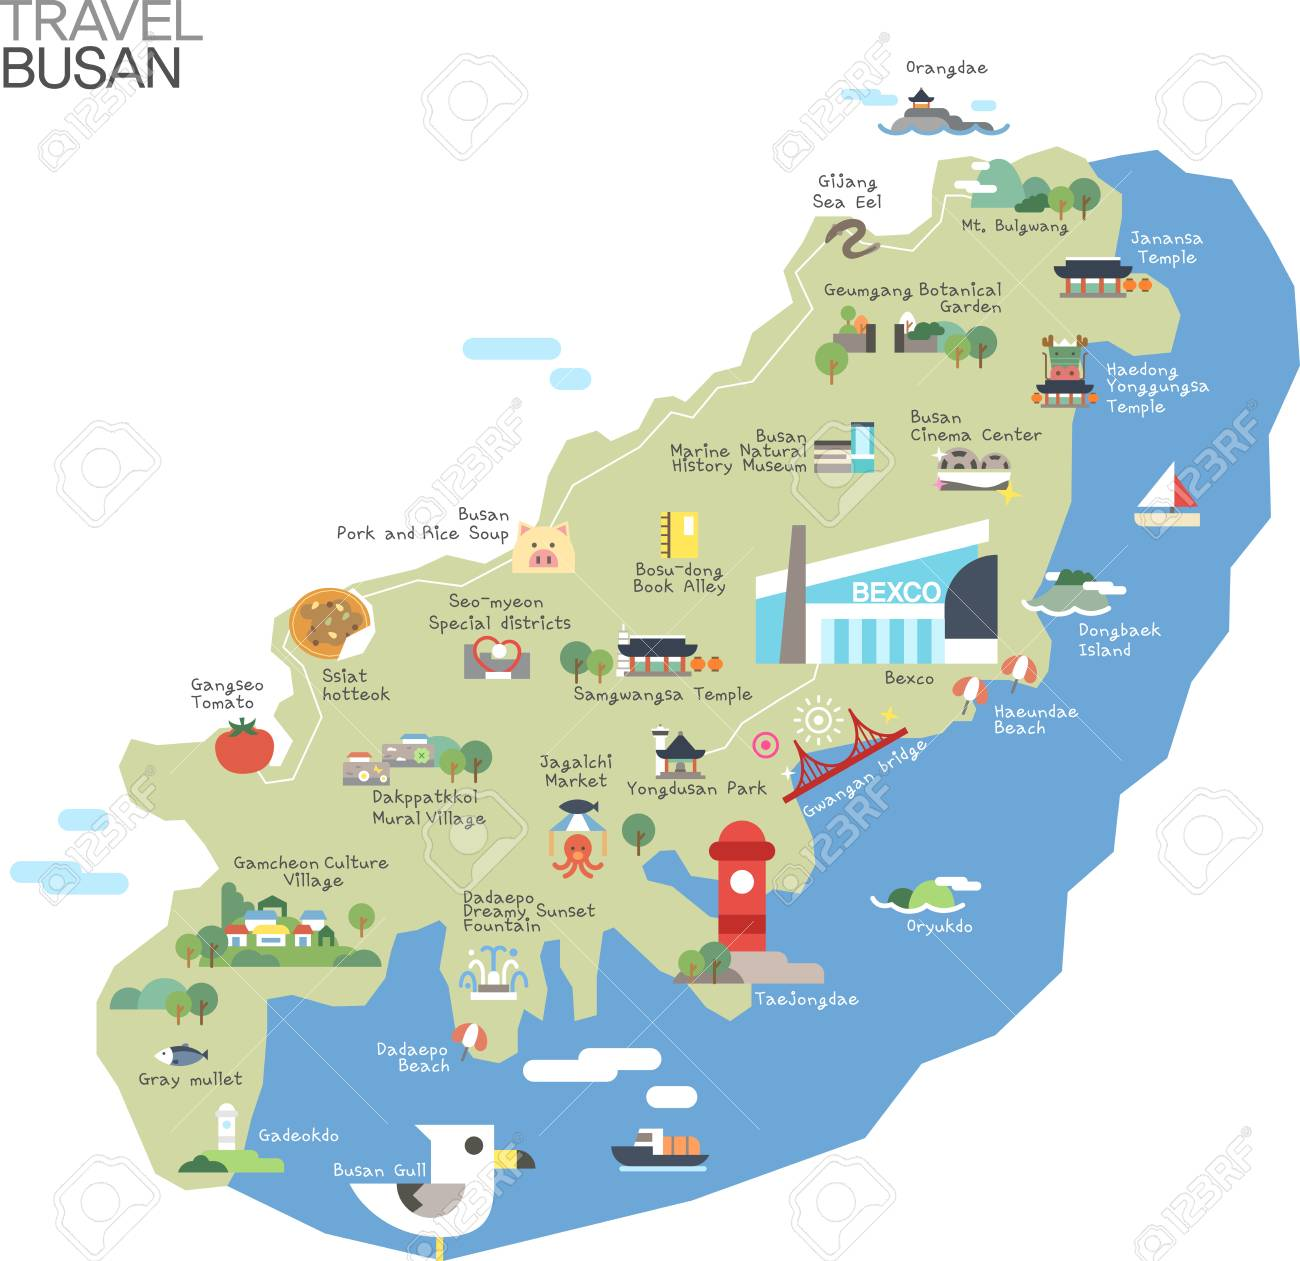 Map Of Busan Pusan Map And Pusan Satellite Image Chloe Wl Guide To - Busan map